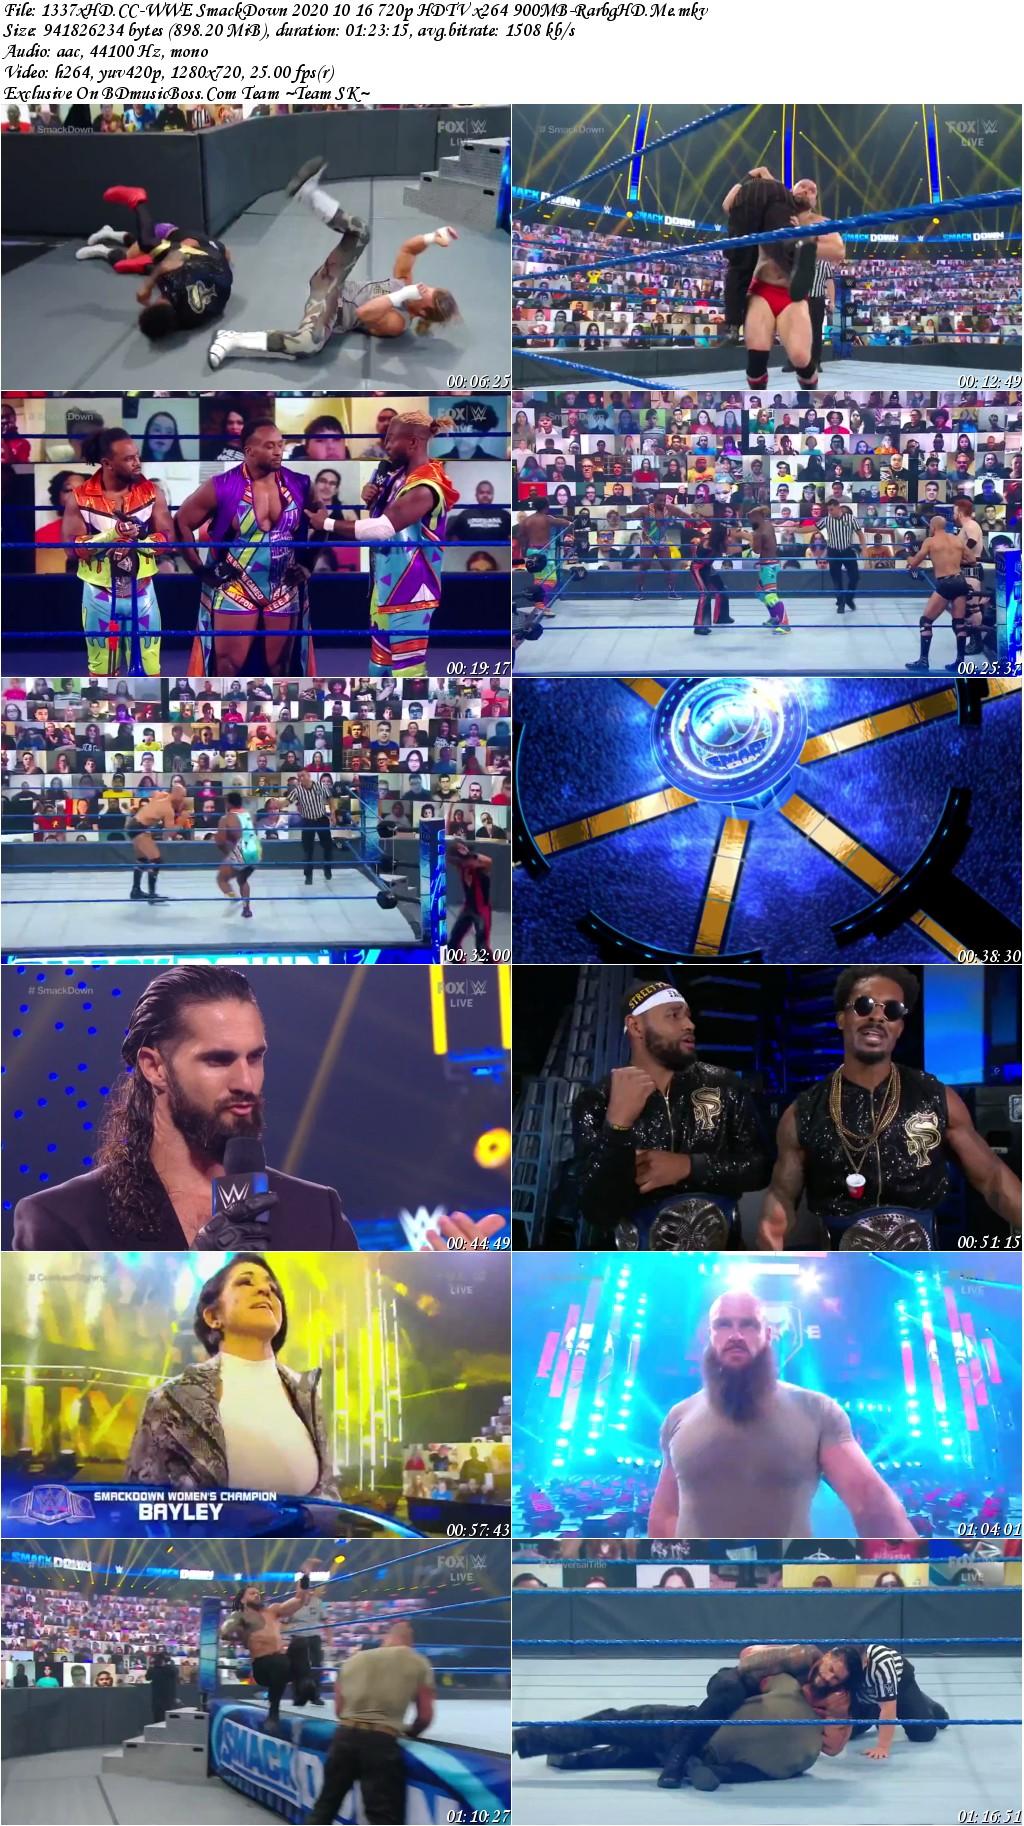 1337x-HD-CC-WWE-Smack-Down-2020-10-16-720p-HDTV-x264-900-MB-Rarbg-HD-Me-s